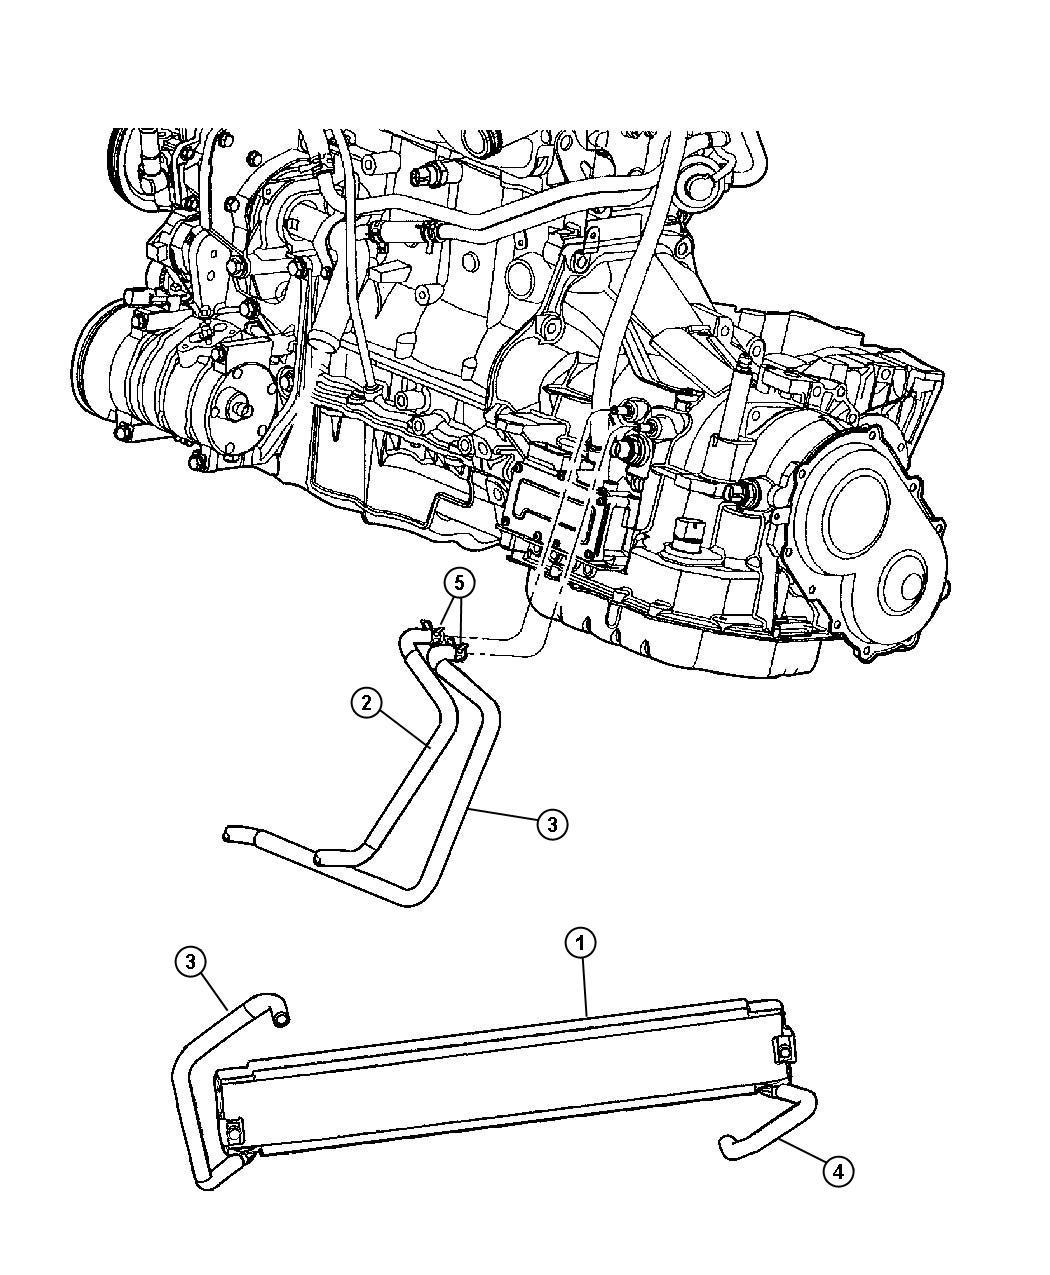 Chrysler Pt Cruiser Engine Diagram Similiar Pt